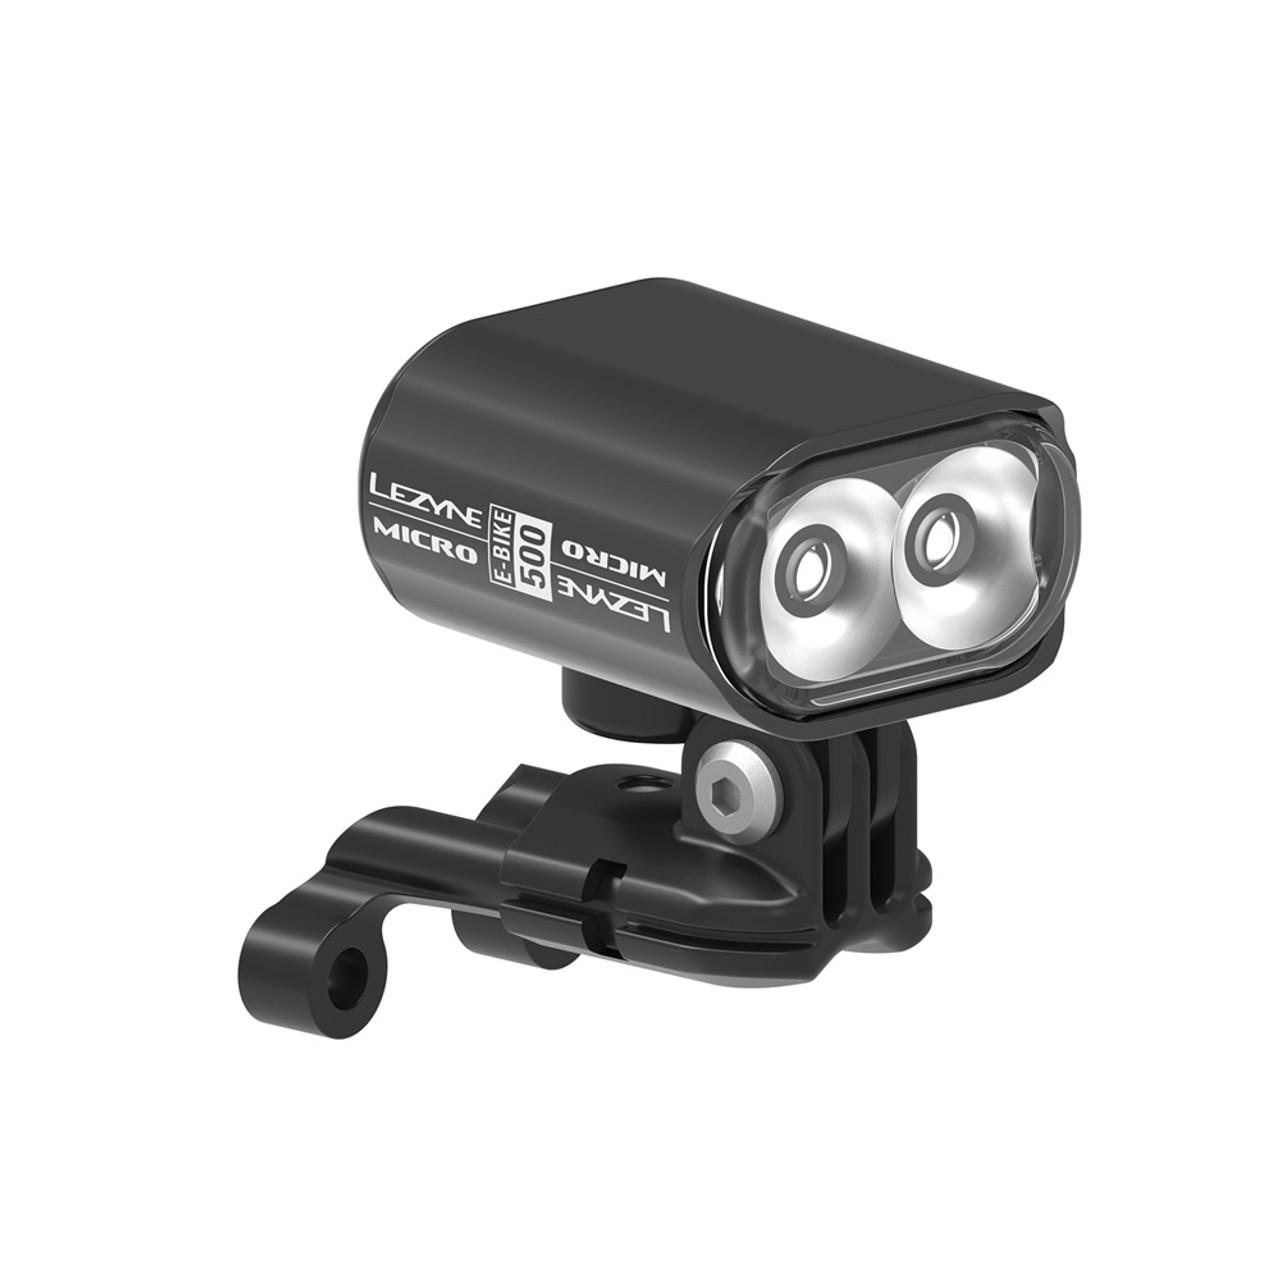 Lezyne E-Bike Micro Drive 500 Front Light In Black